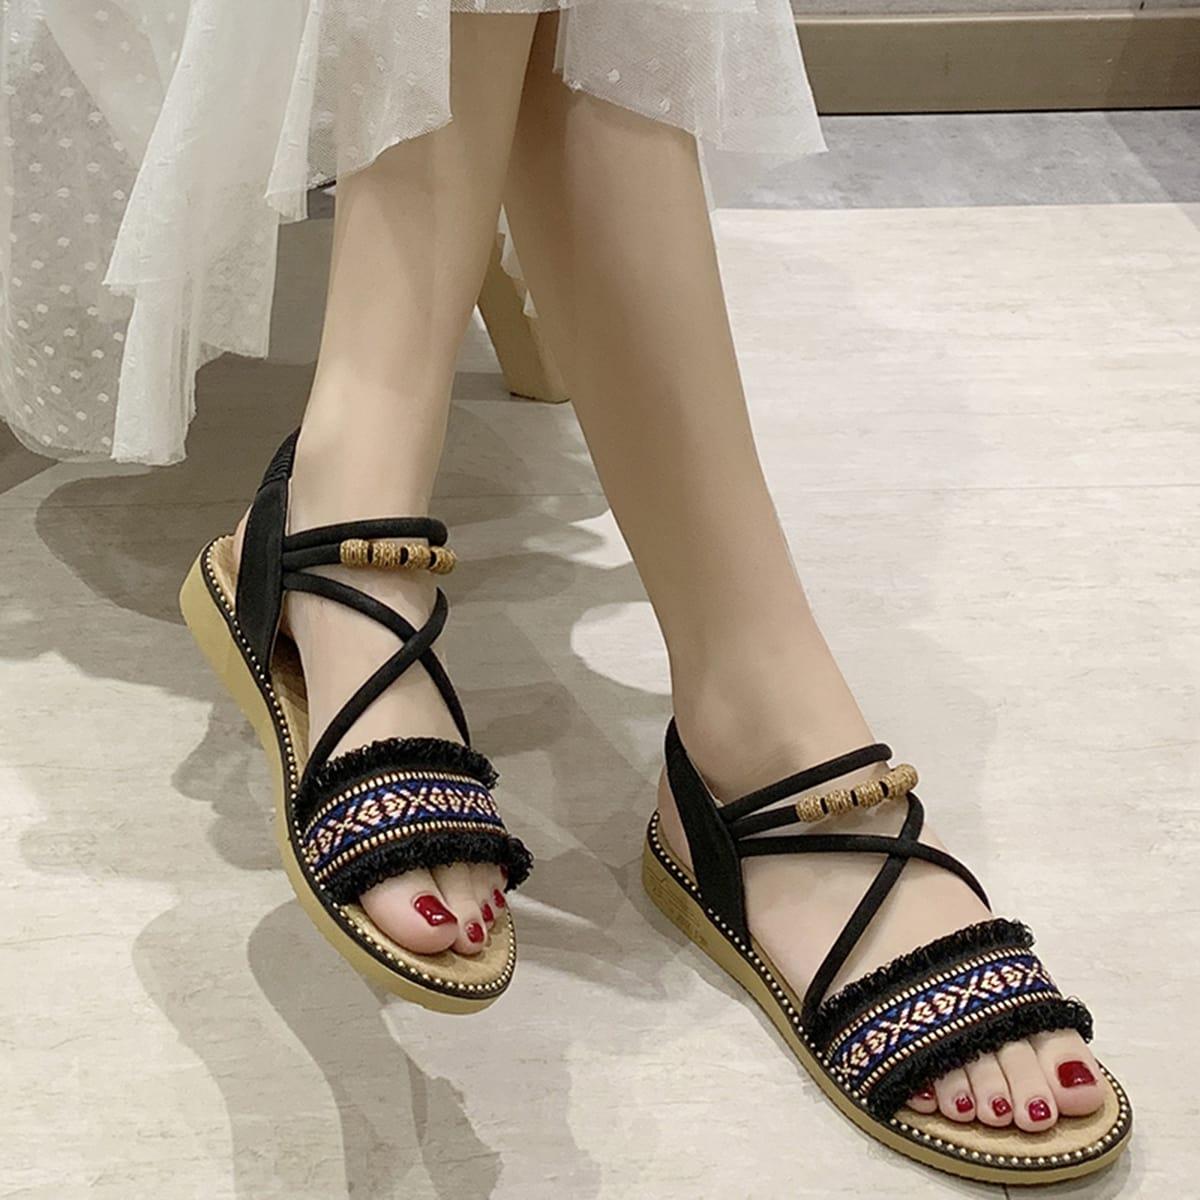 Tribal patroon open sandalen met gekruiste bandjes